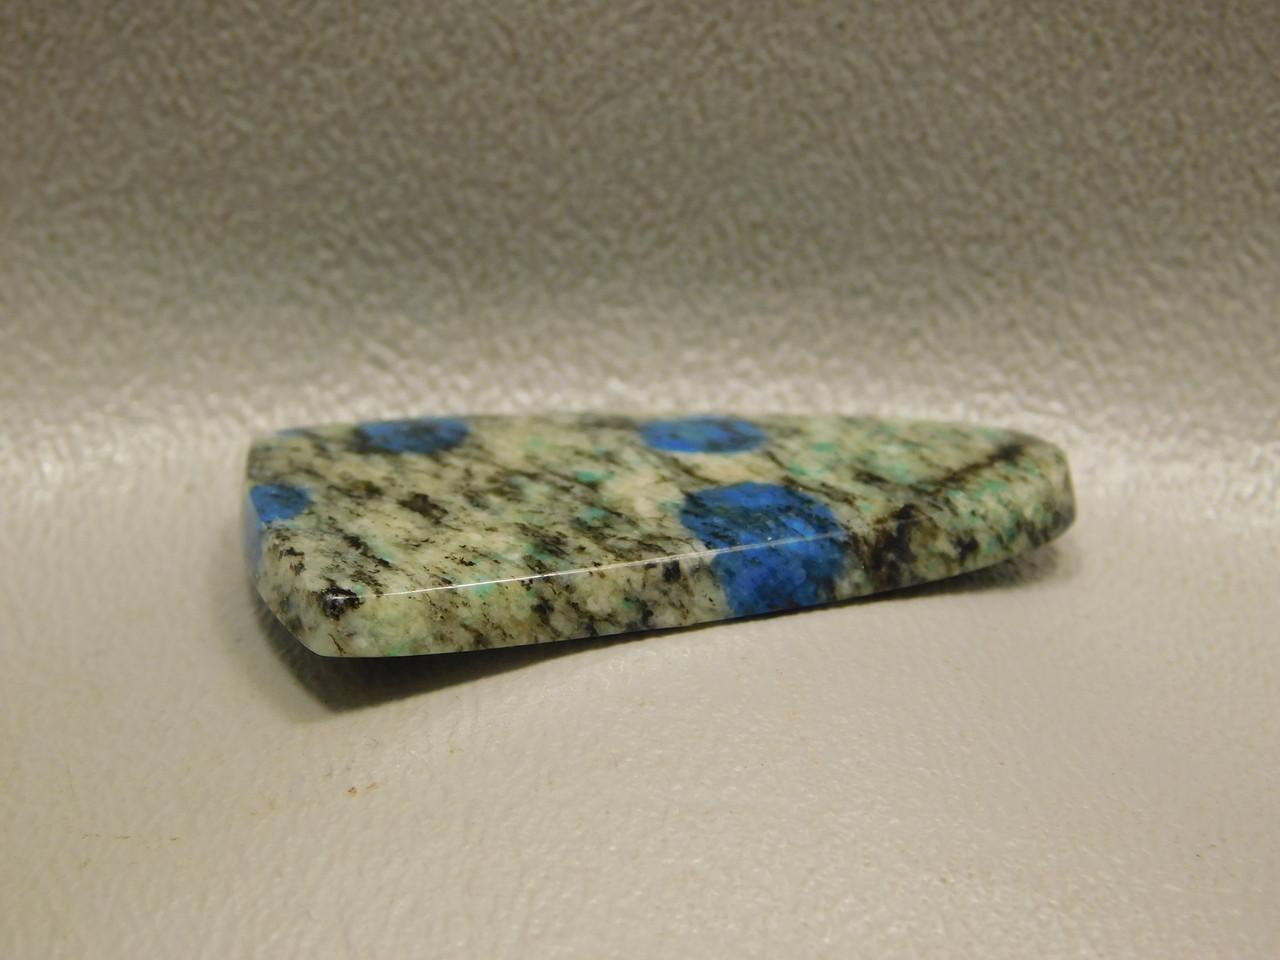 Cabochon K2 Blue Spotted Gray Stone Semi Precious Gemstone 10